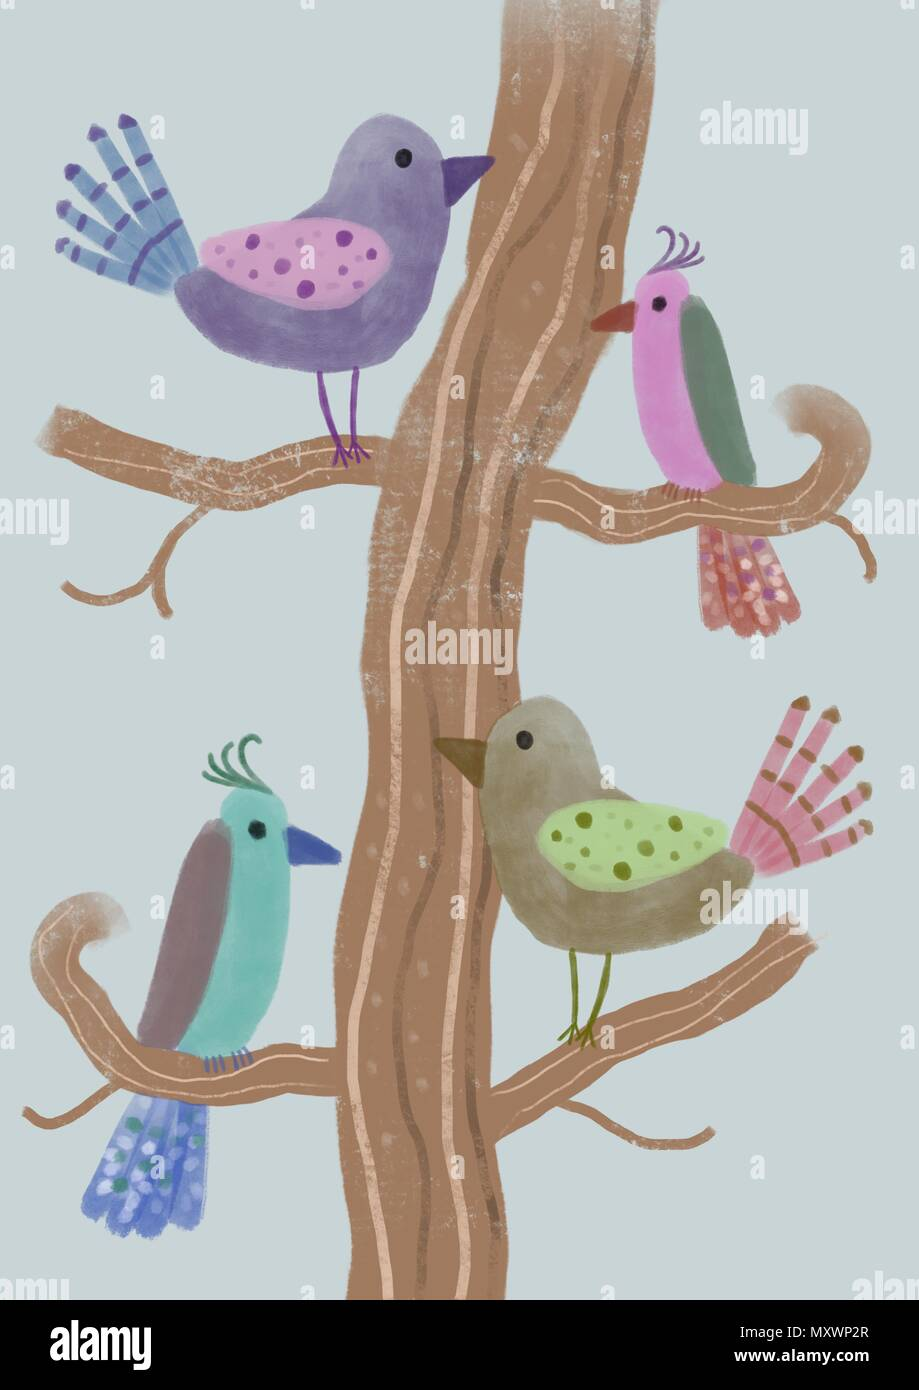 cute illustration of birds - Stock Image